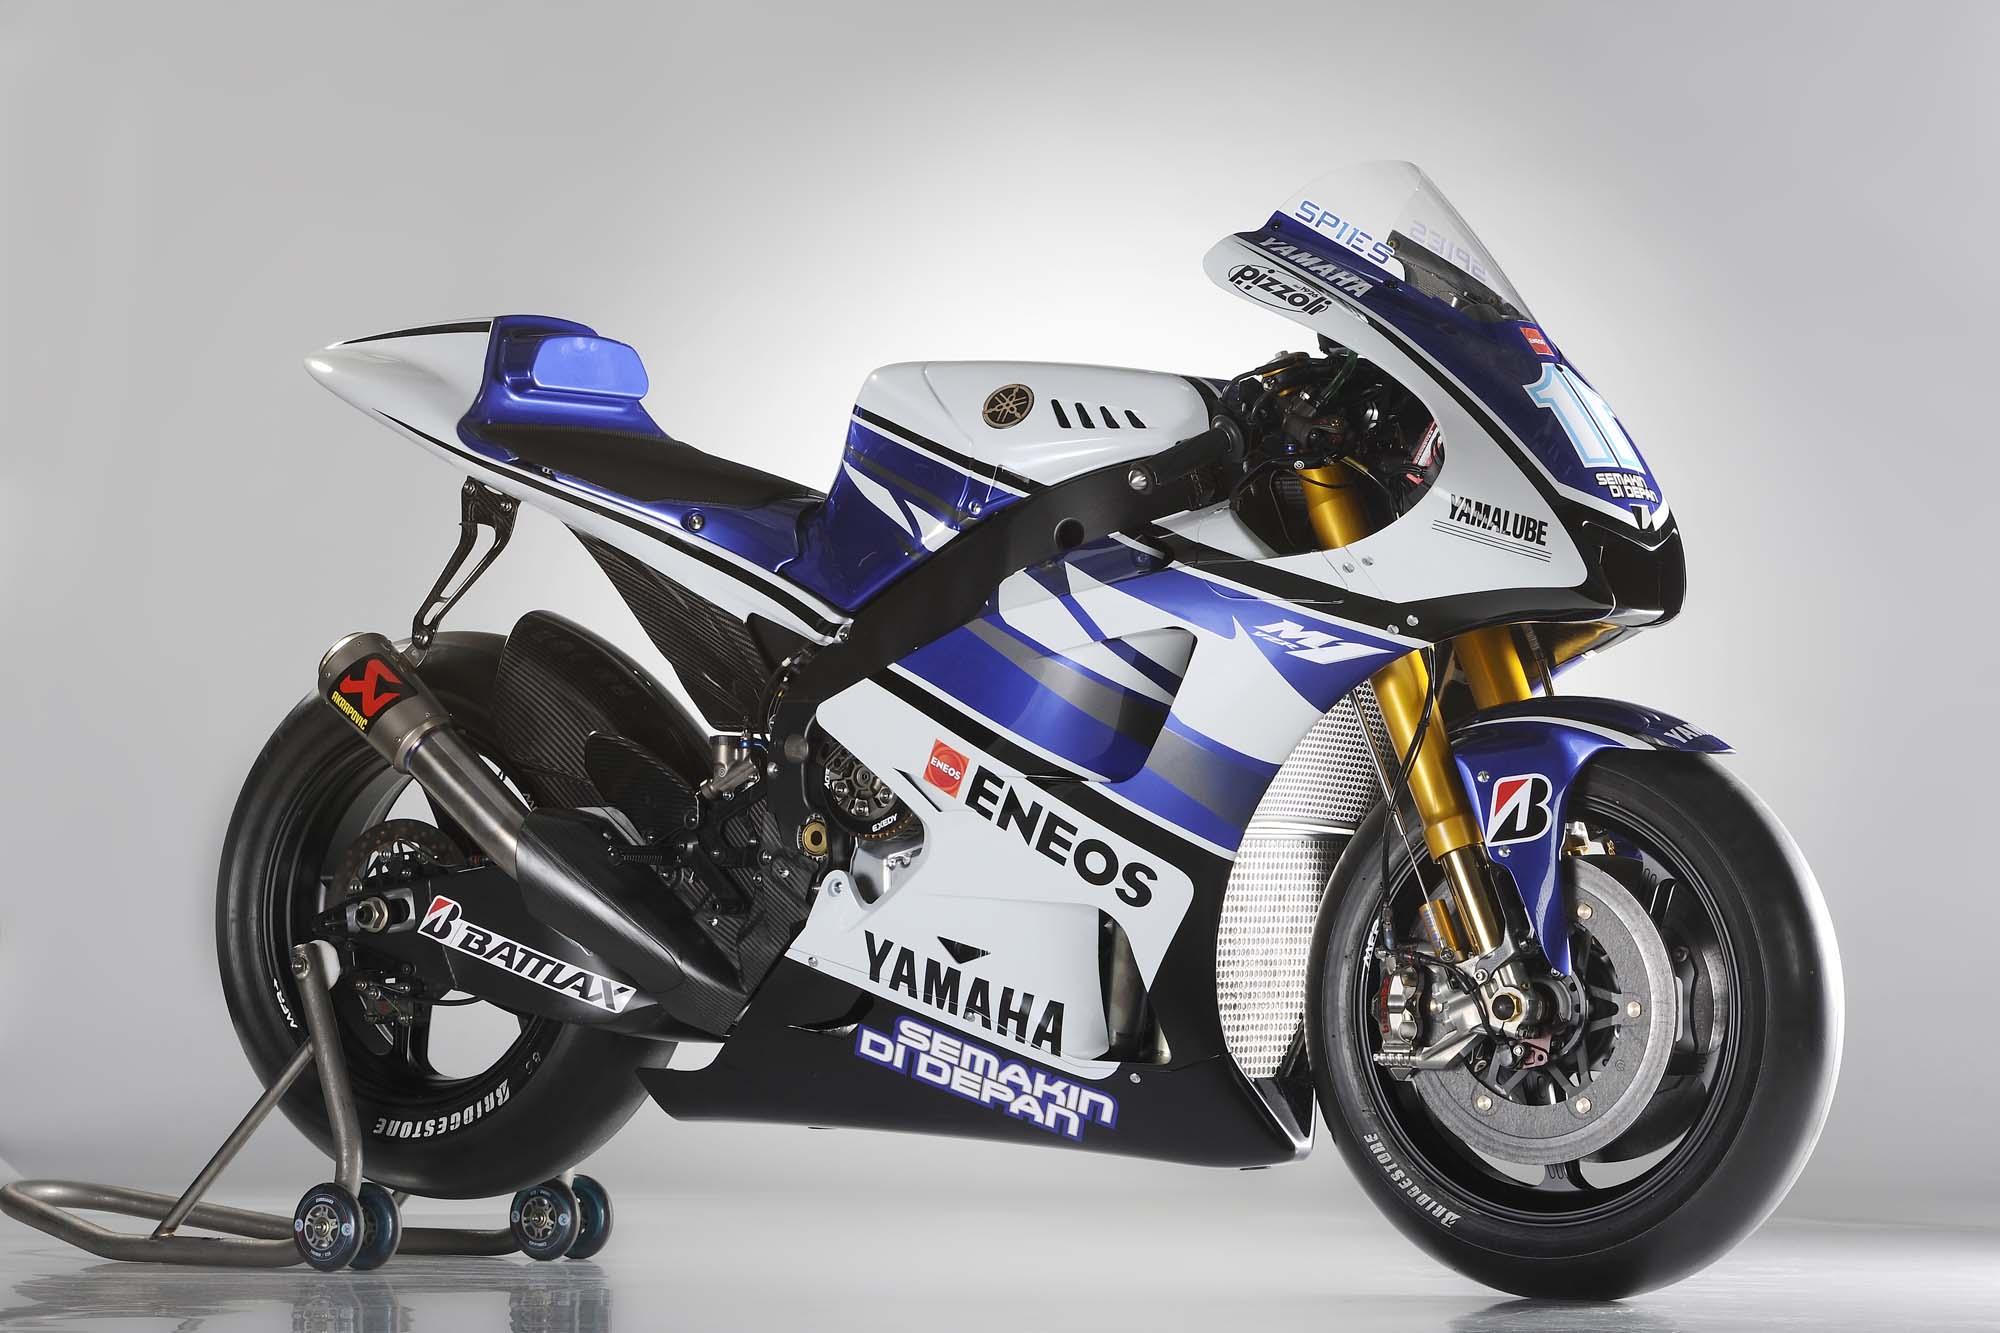 2012 Yamaha Yzr M1 Breaks Cover At Jerez Asphalt Rubber